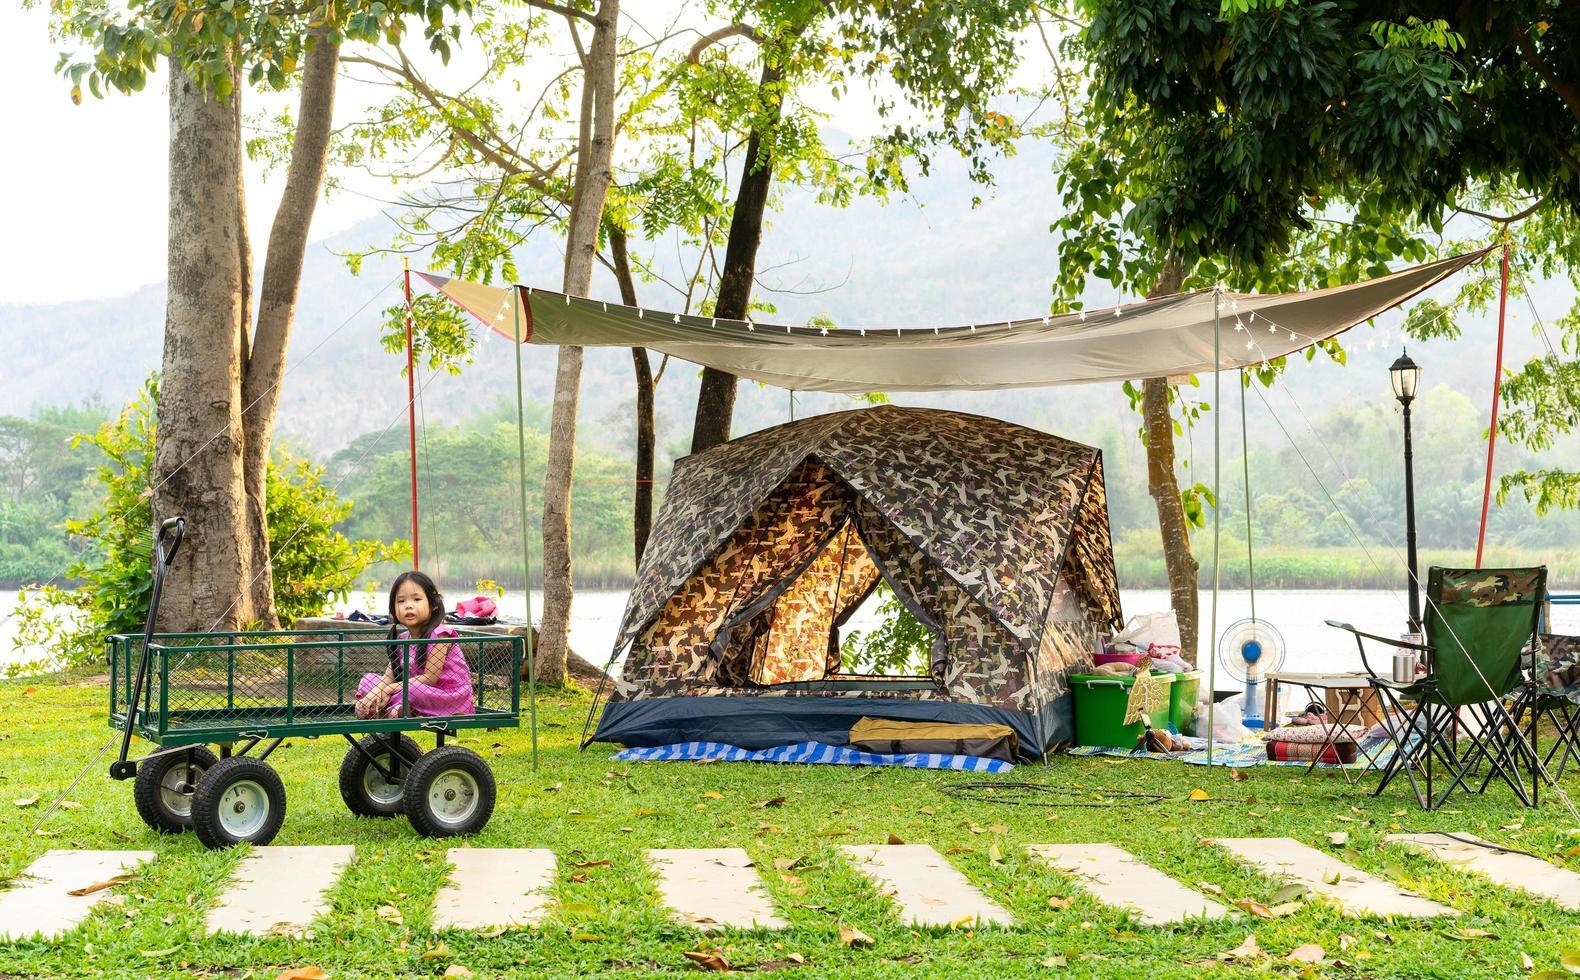 jovem menina asiática na carroça no parque de campismo foto